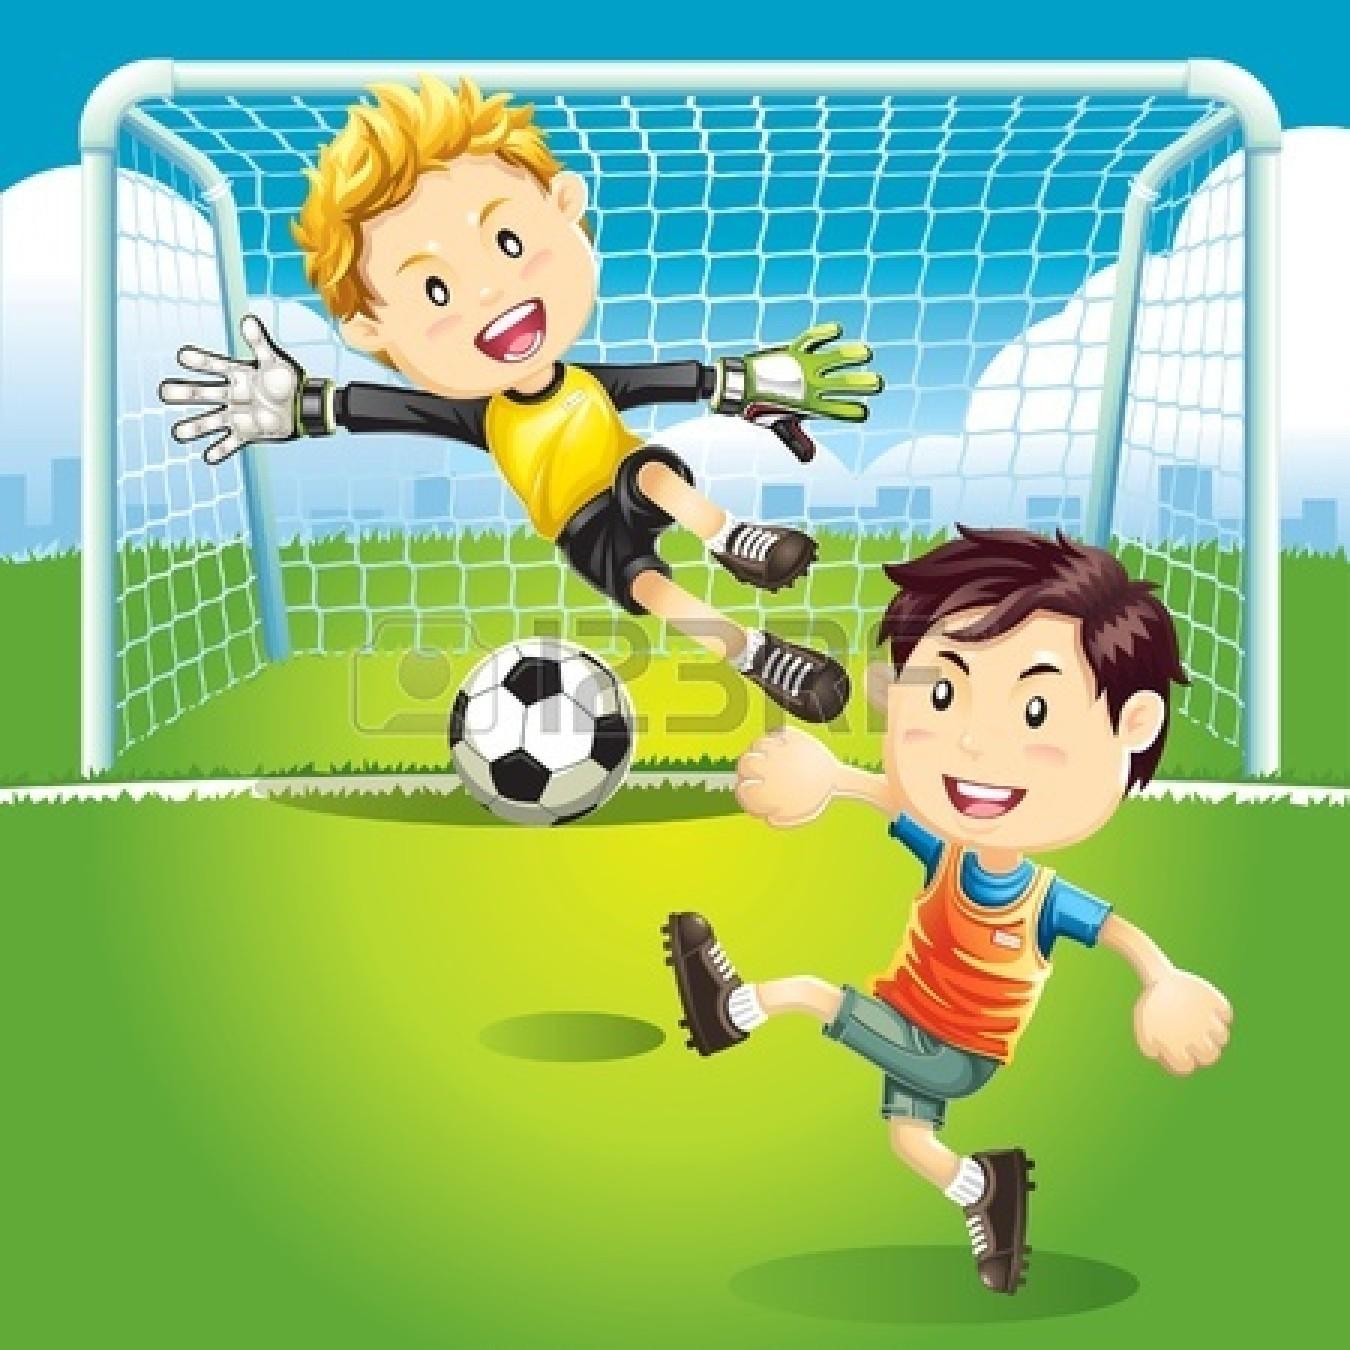 to the a football match free images at clker com clip art tennis ball throwing clip art tennis ball throwing